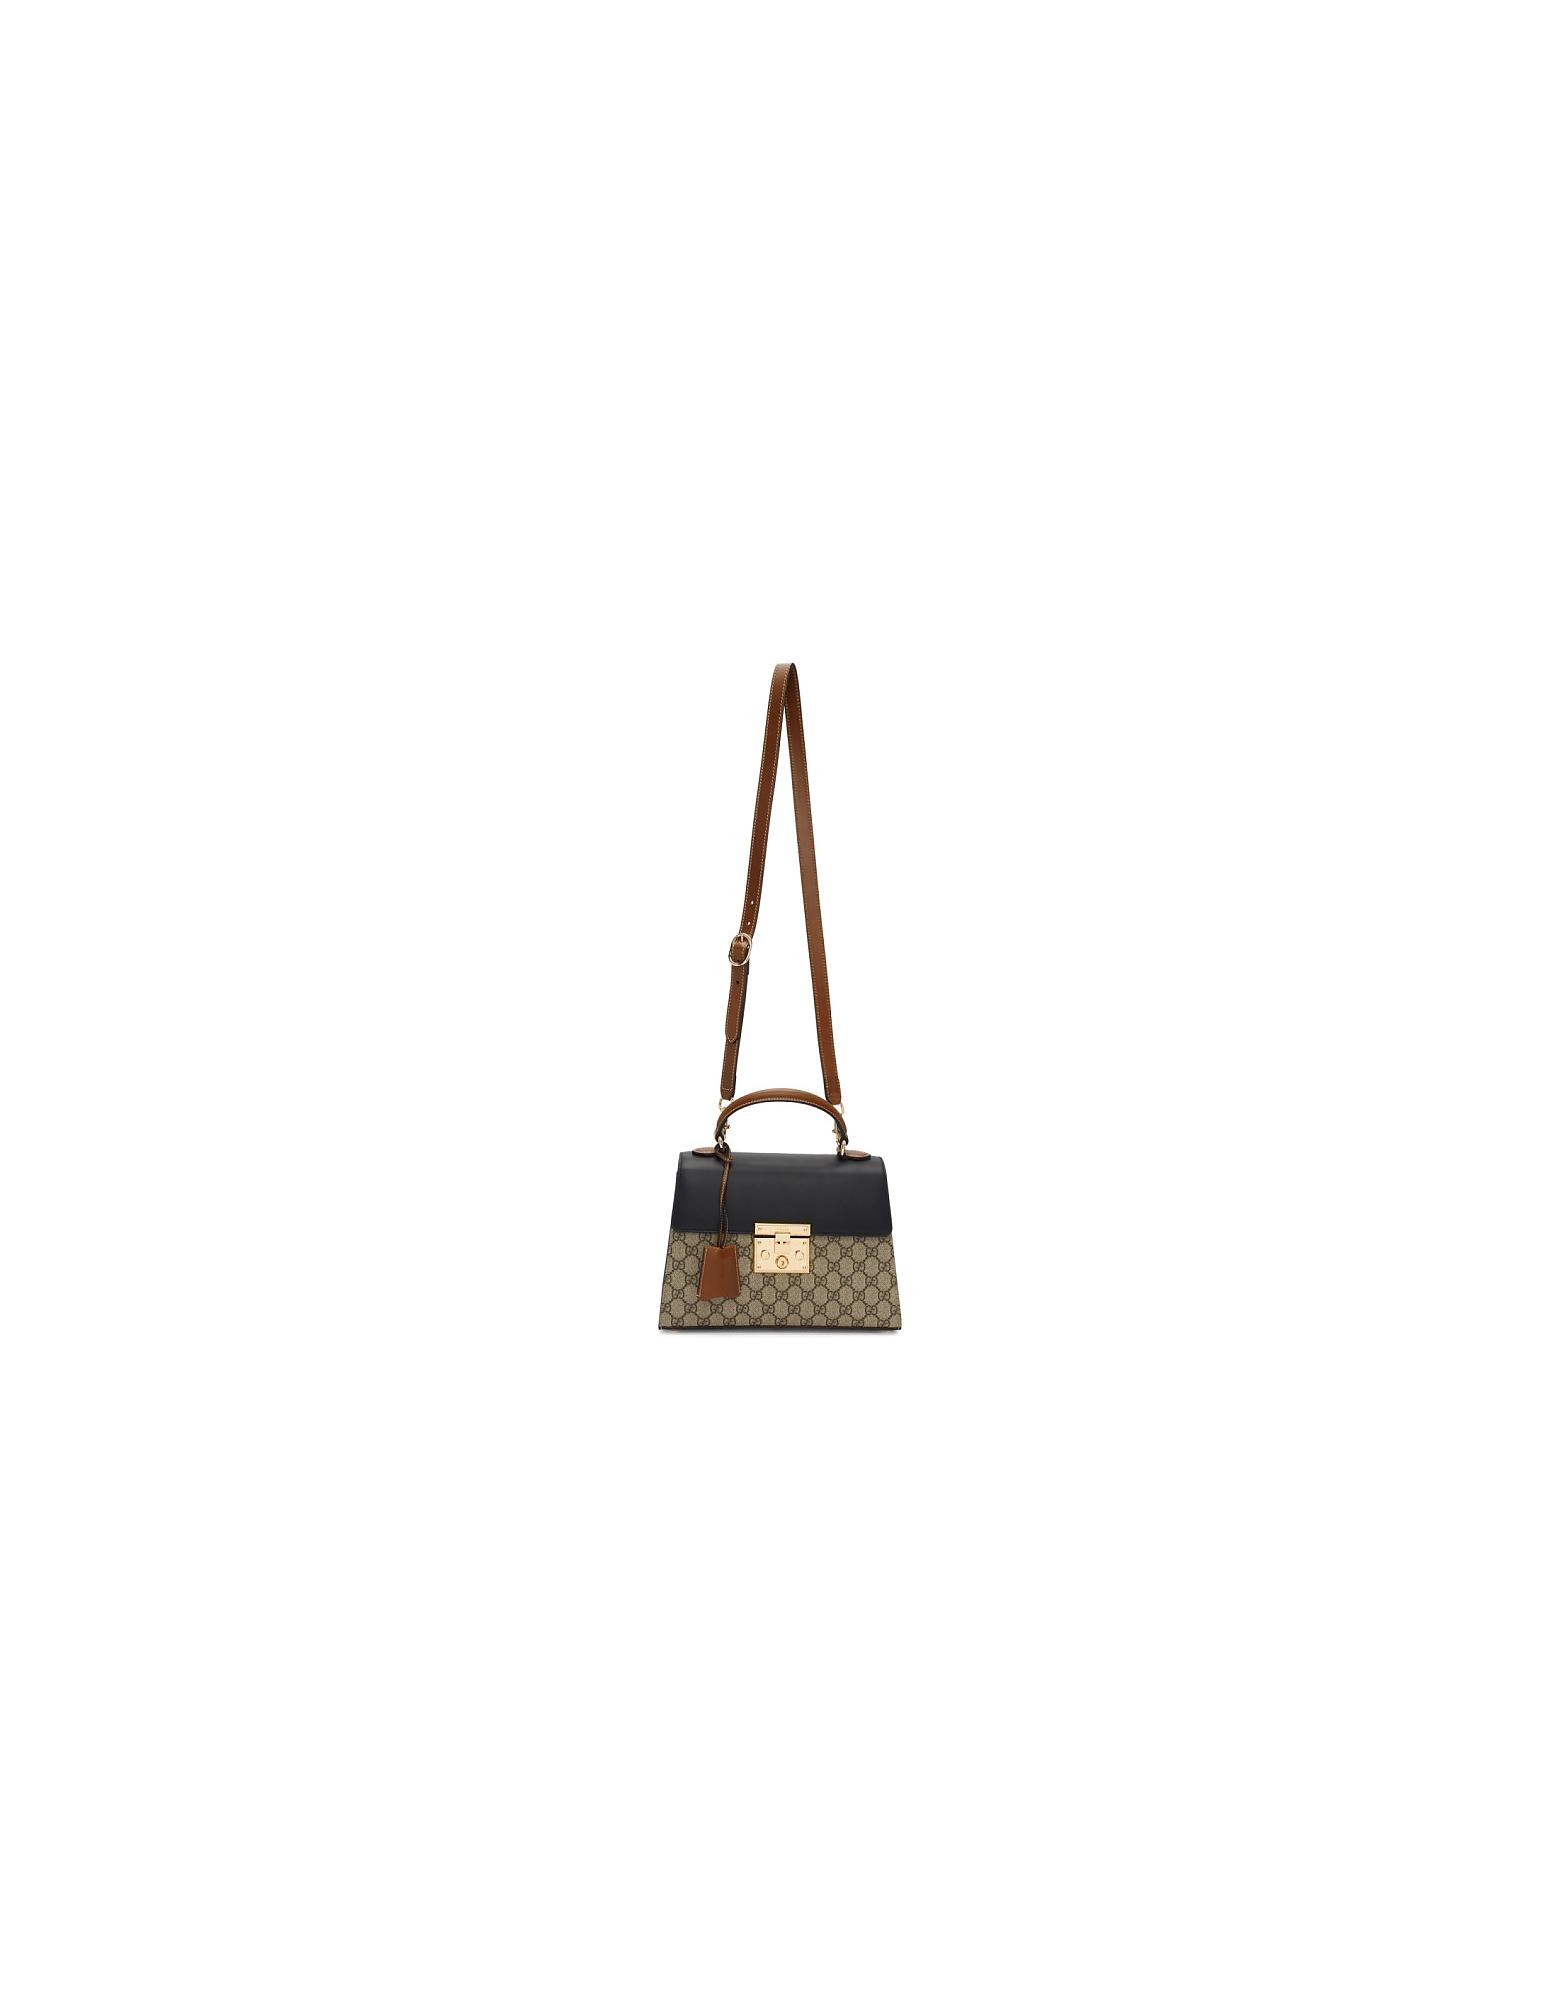 Gucci Designer Handbags, Brown Small GG Supreme Padlock Bag